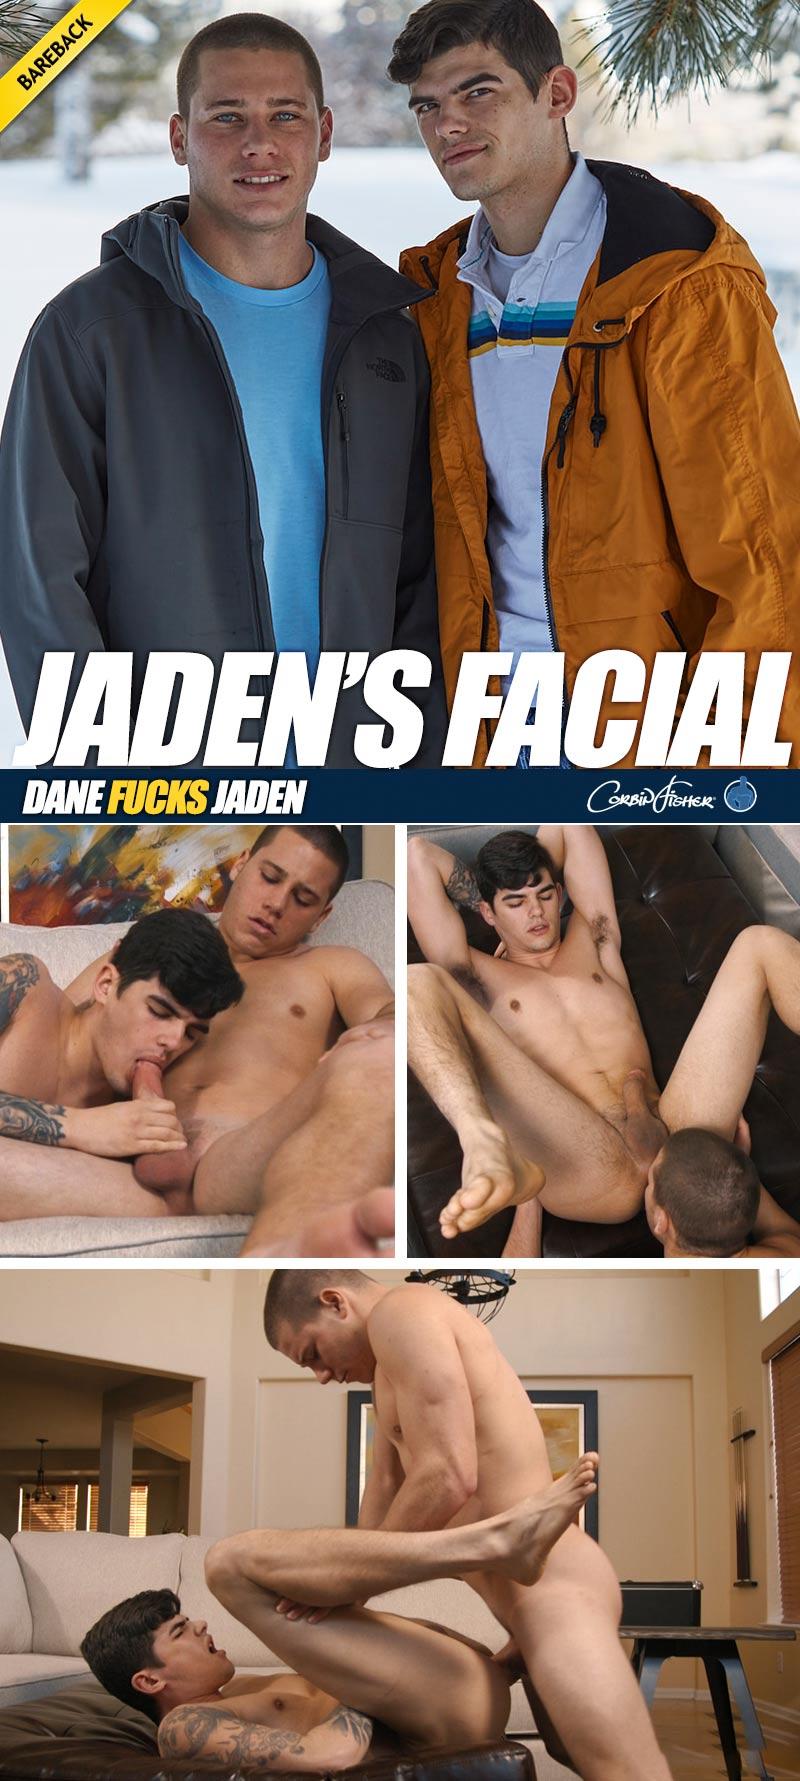 Jaden's Facial (Dane Fucks Jaden) (Bareback) at CorbinFisher